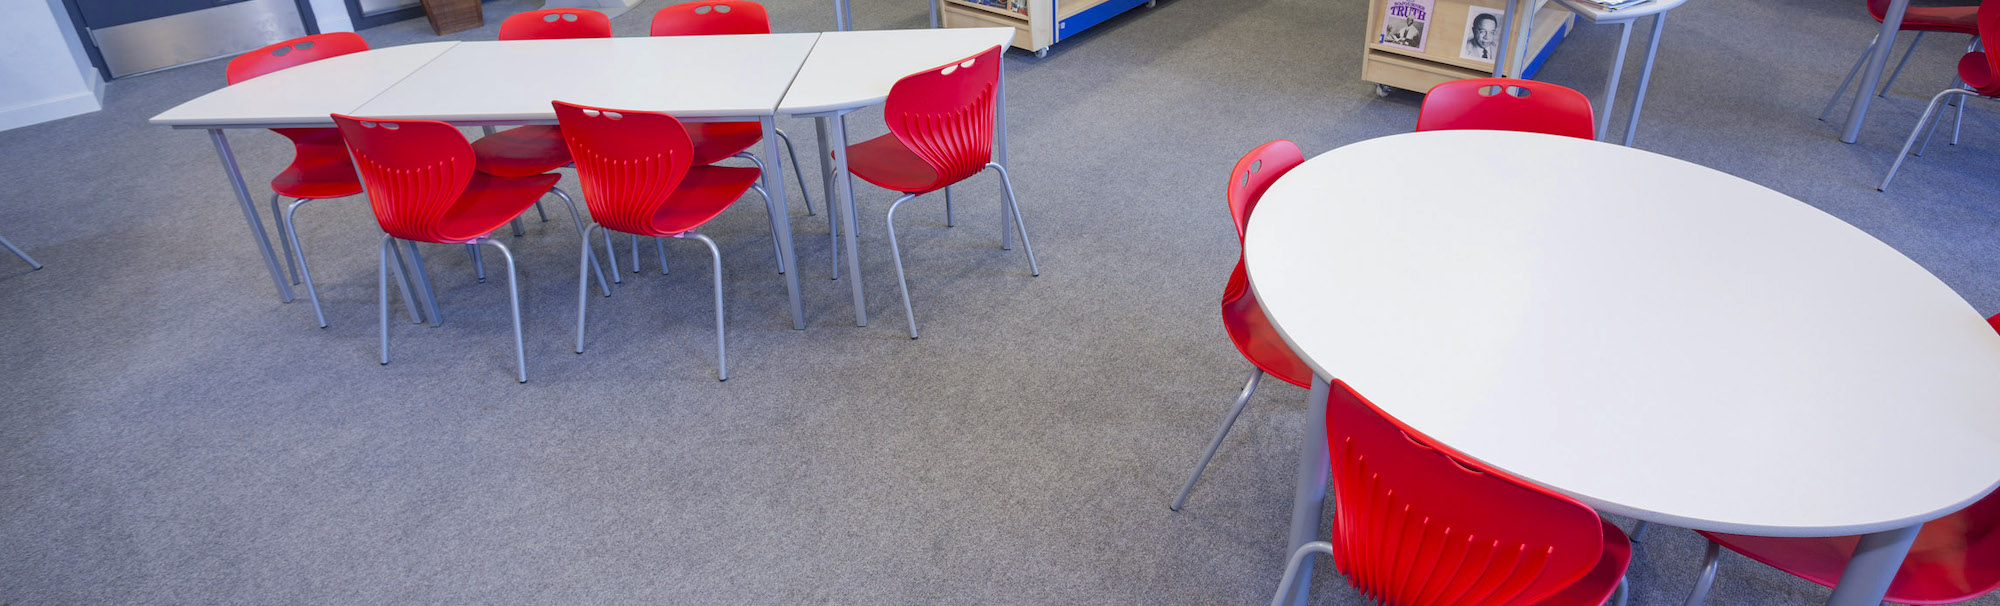 Heckmondwike | Commercial Carpet and Carpet Tiles | Supacord